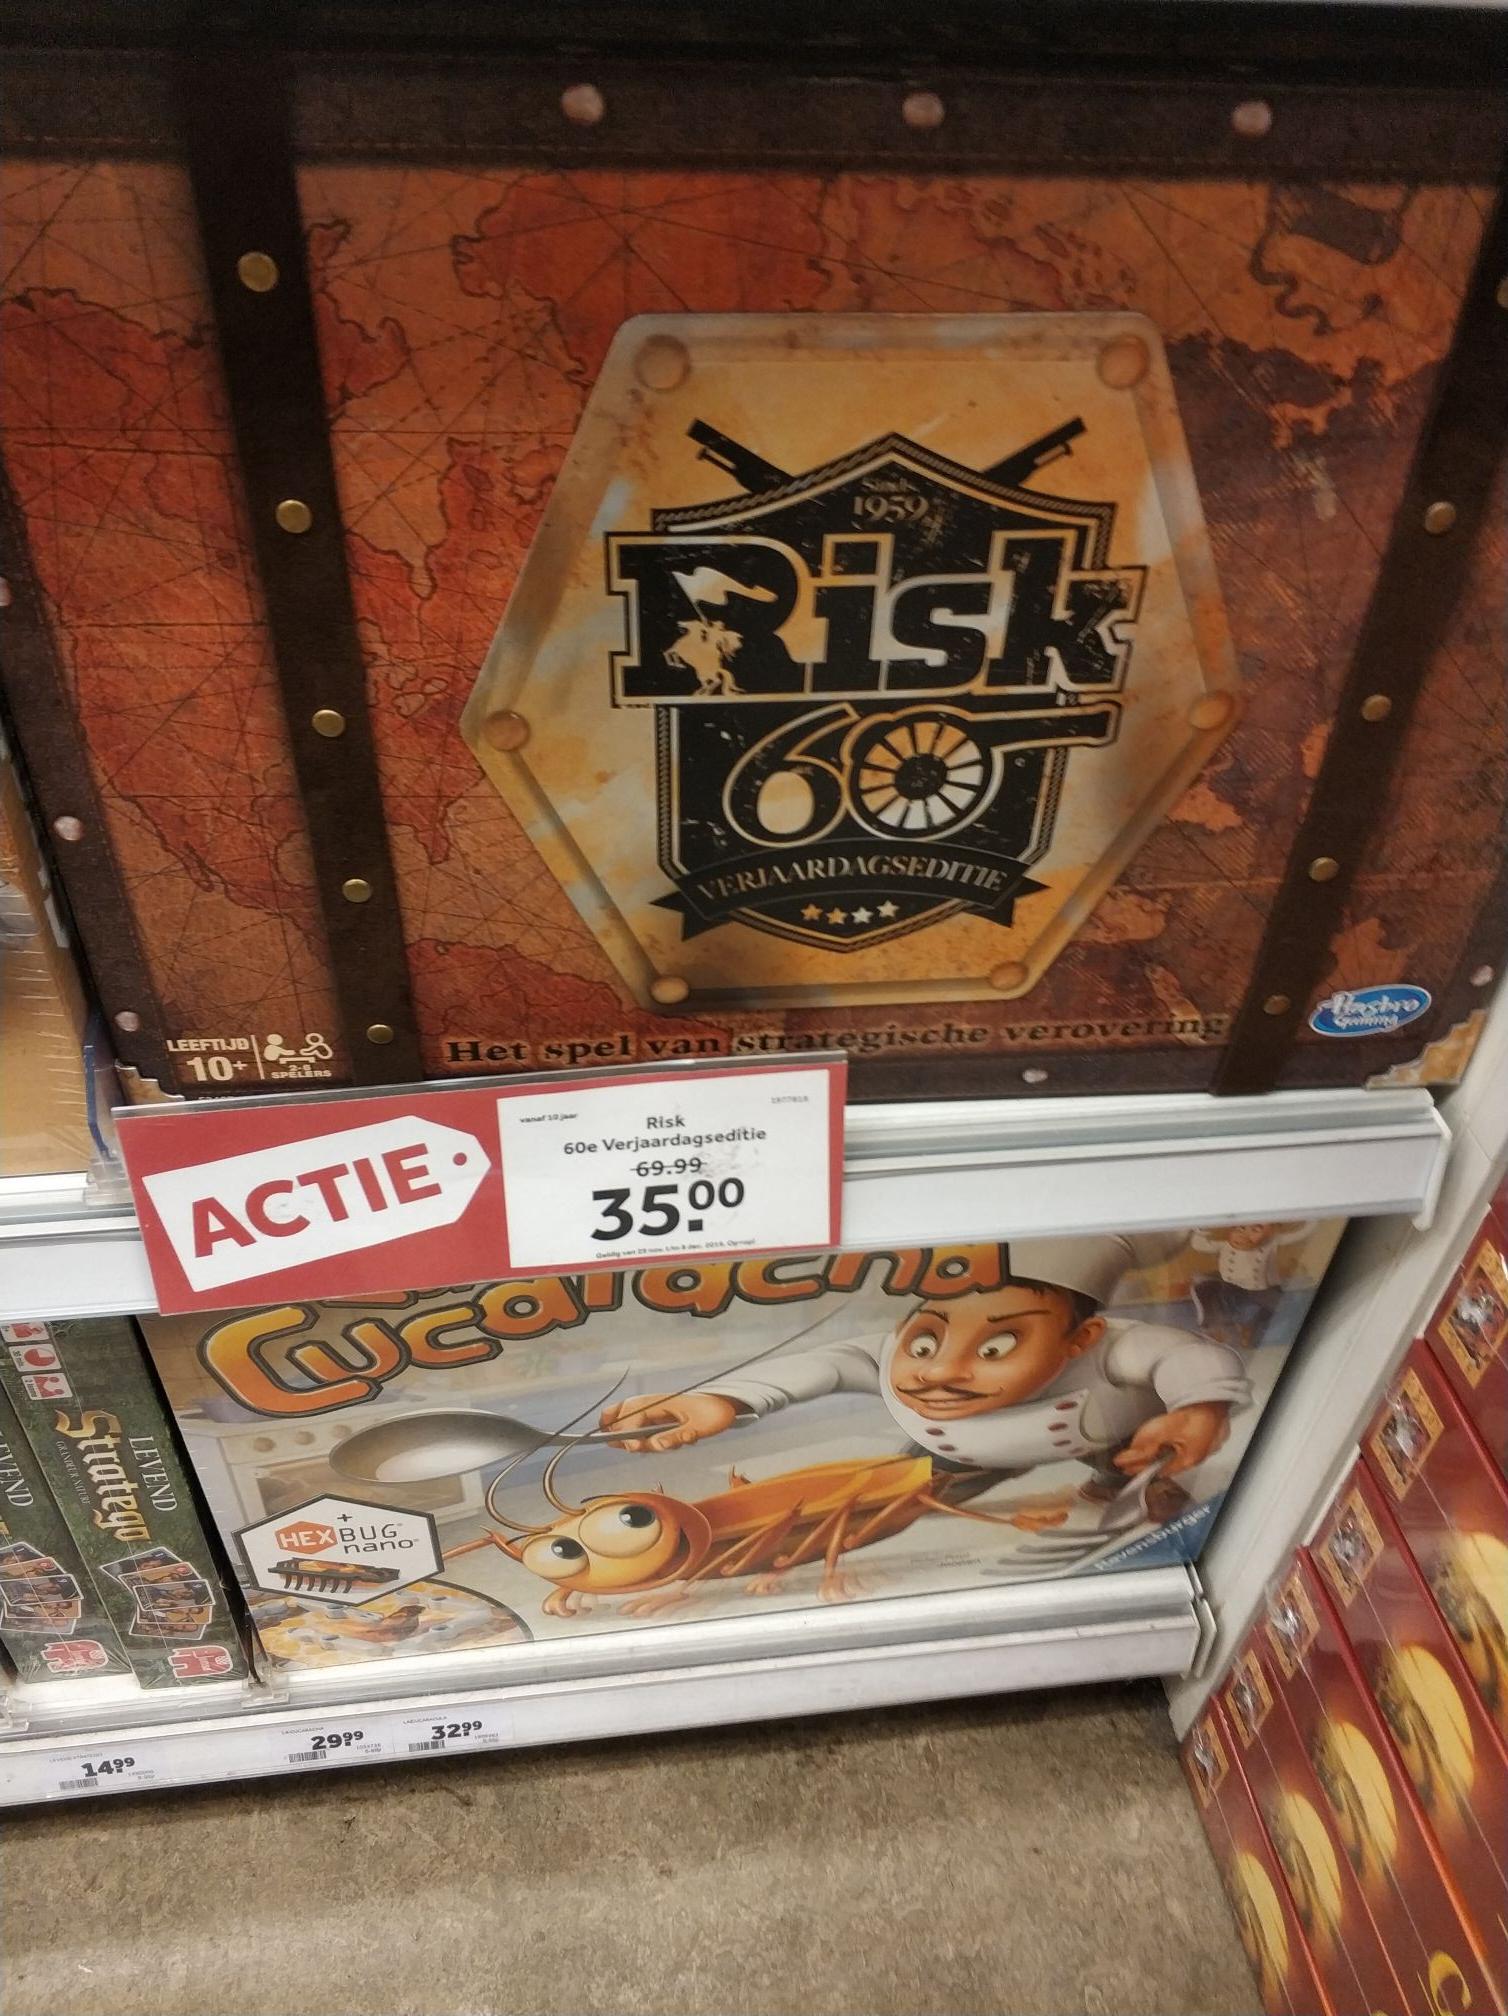 [winkel only] Risk 60-jaar jubileum editie @intertoys